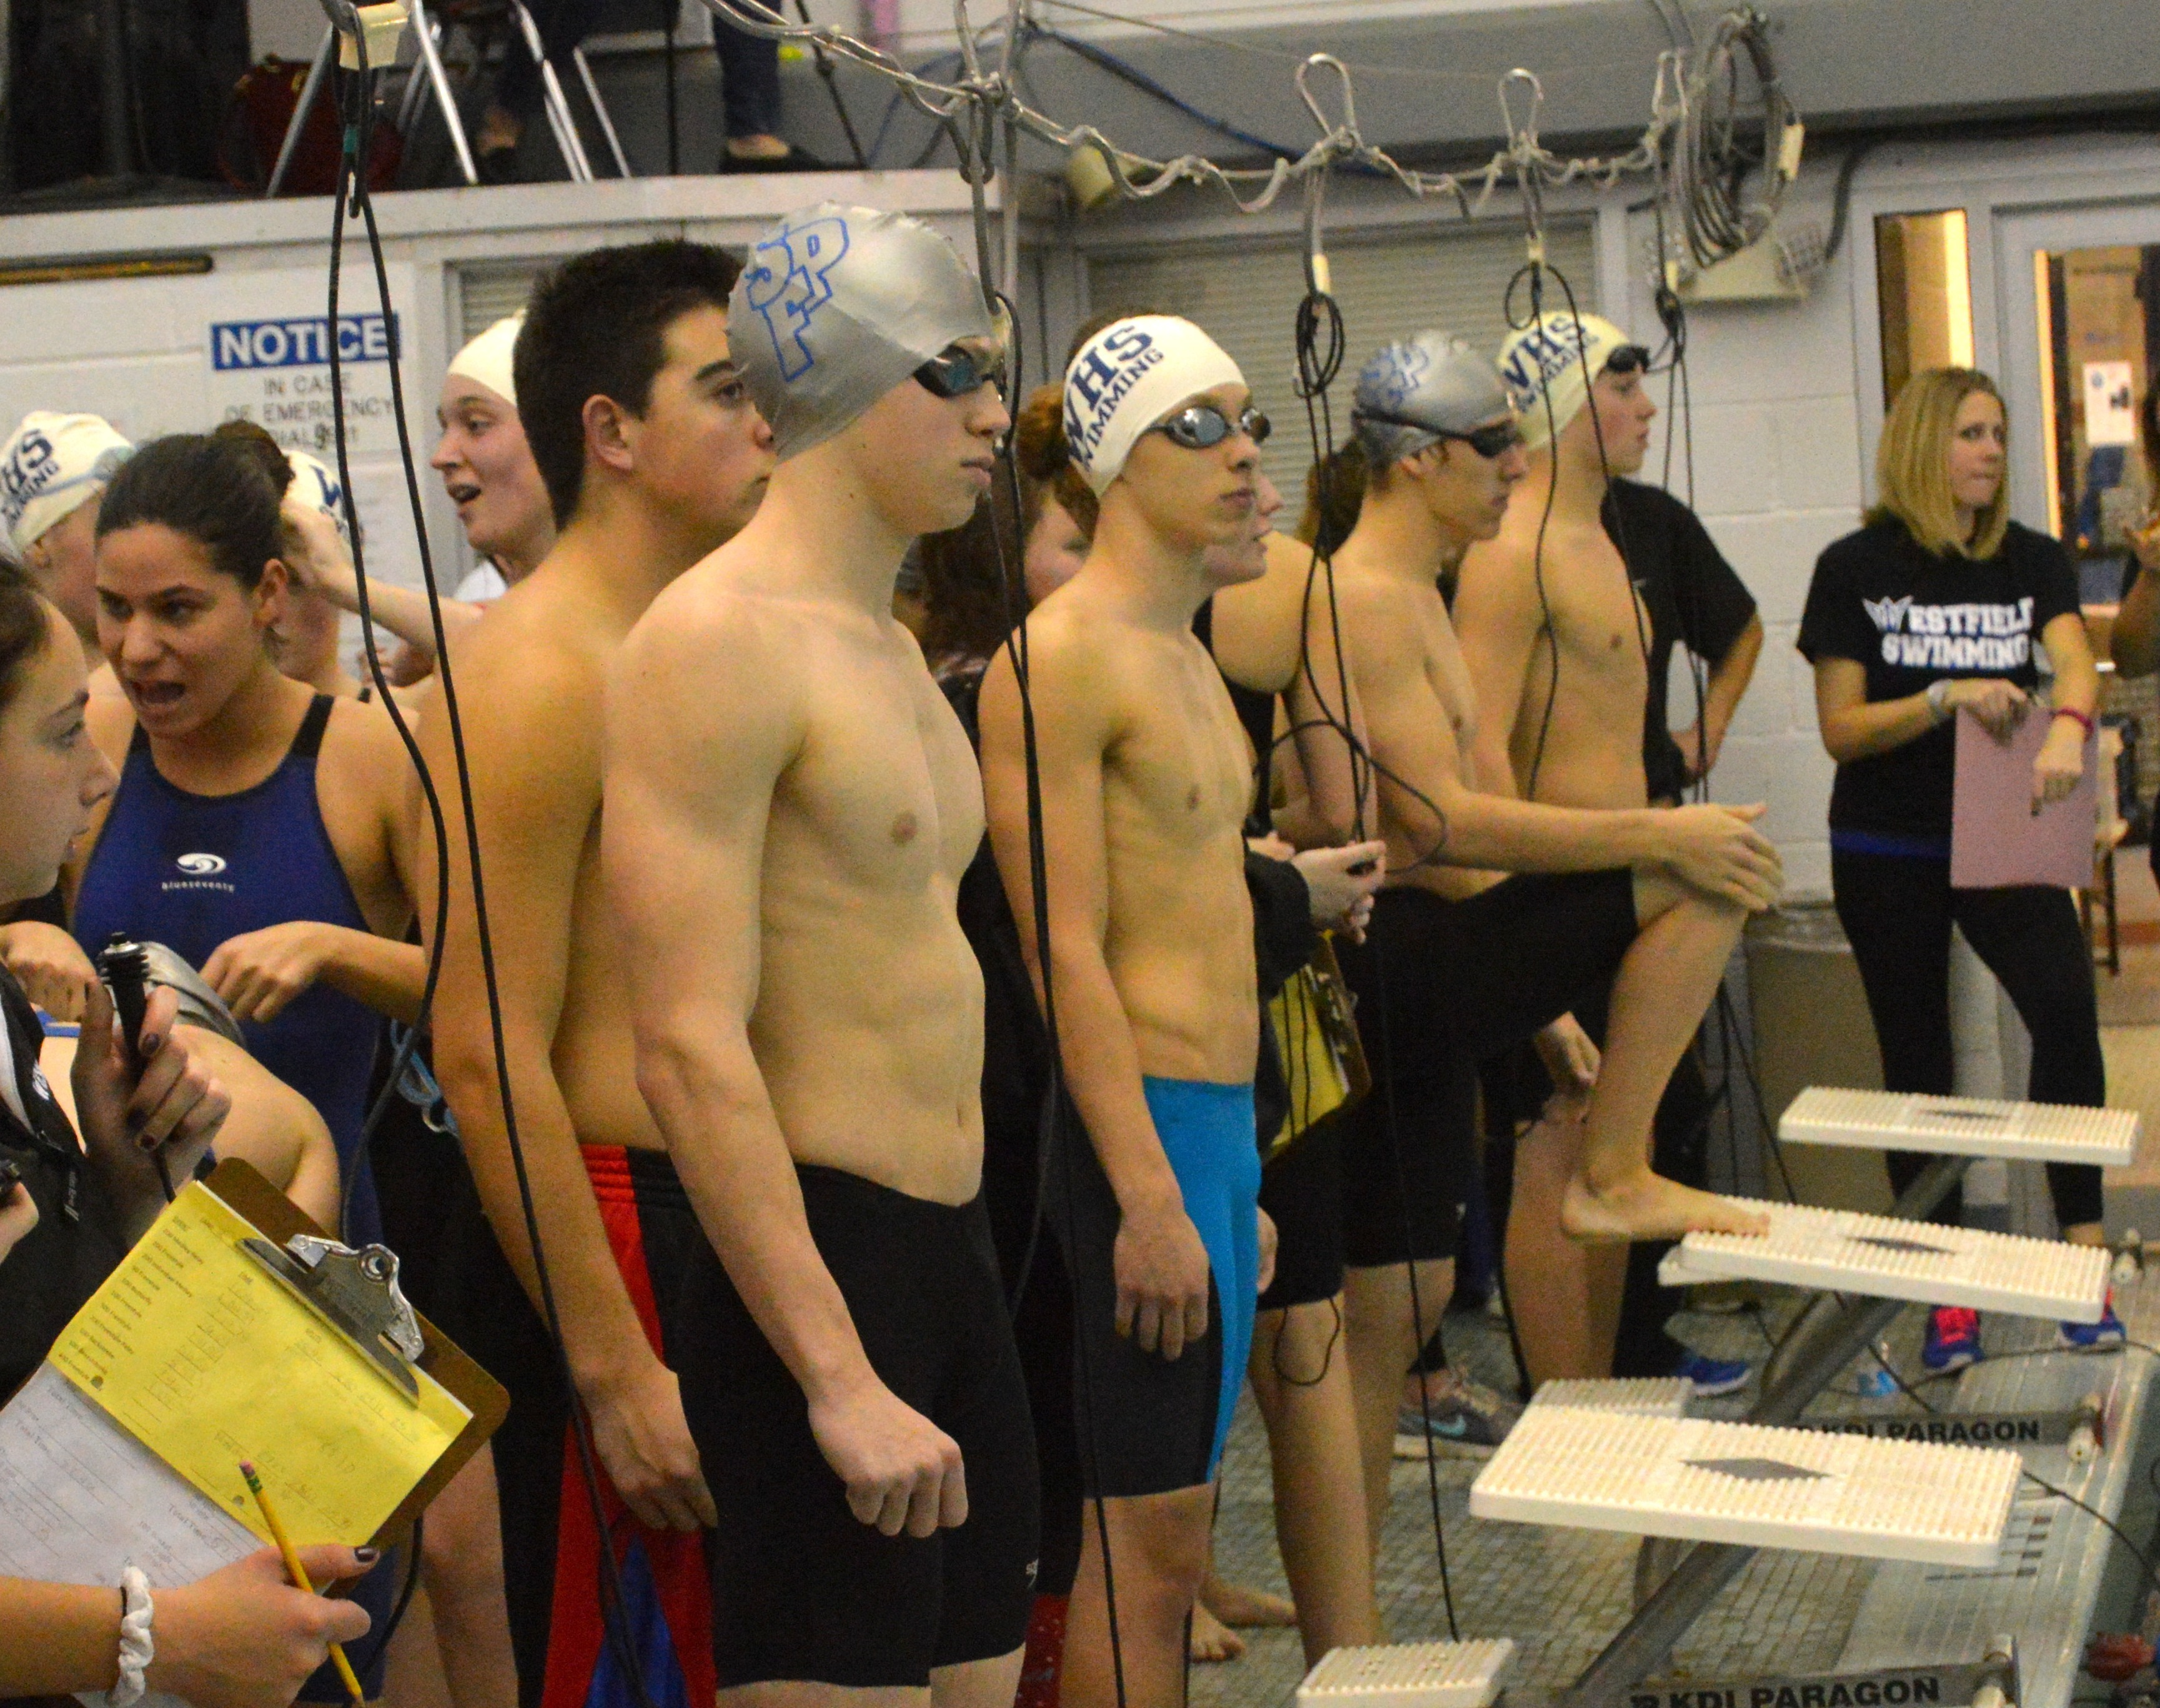 9cc13ee8e884f055c38f_WF-SPF_Chris_Bondarowicz_before_record-breaking_swim.JPG